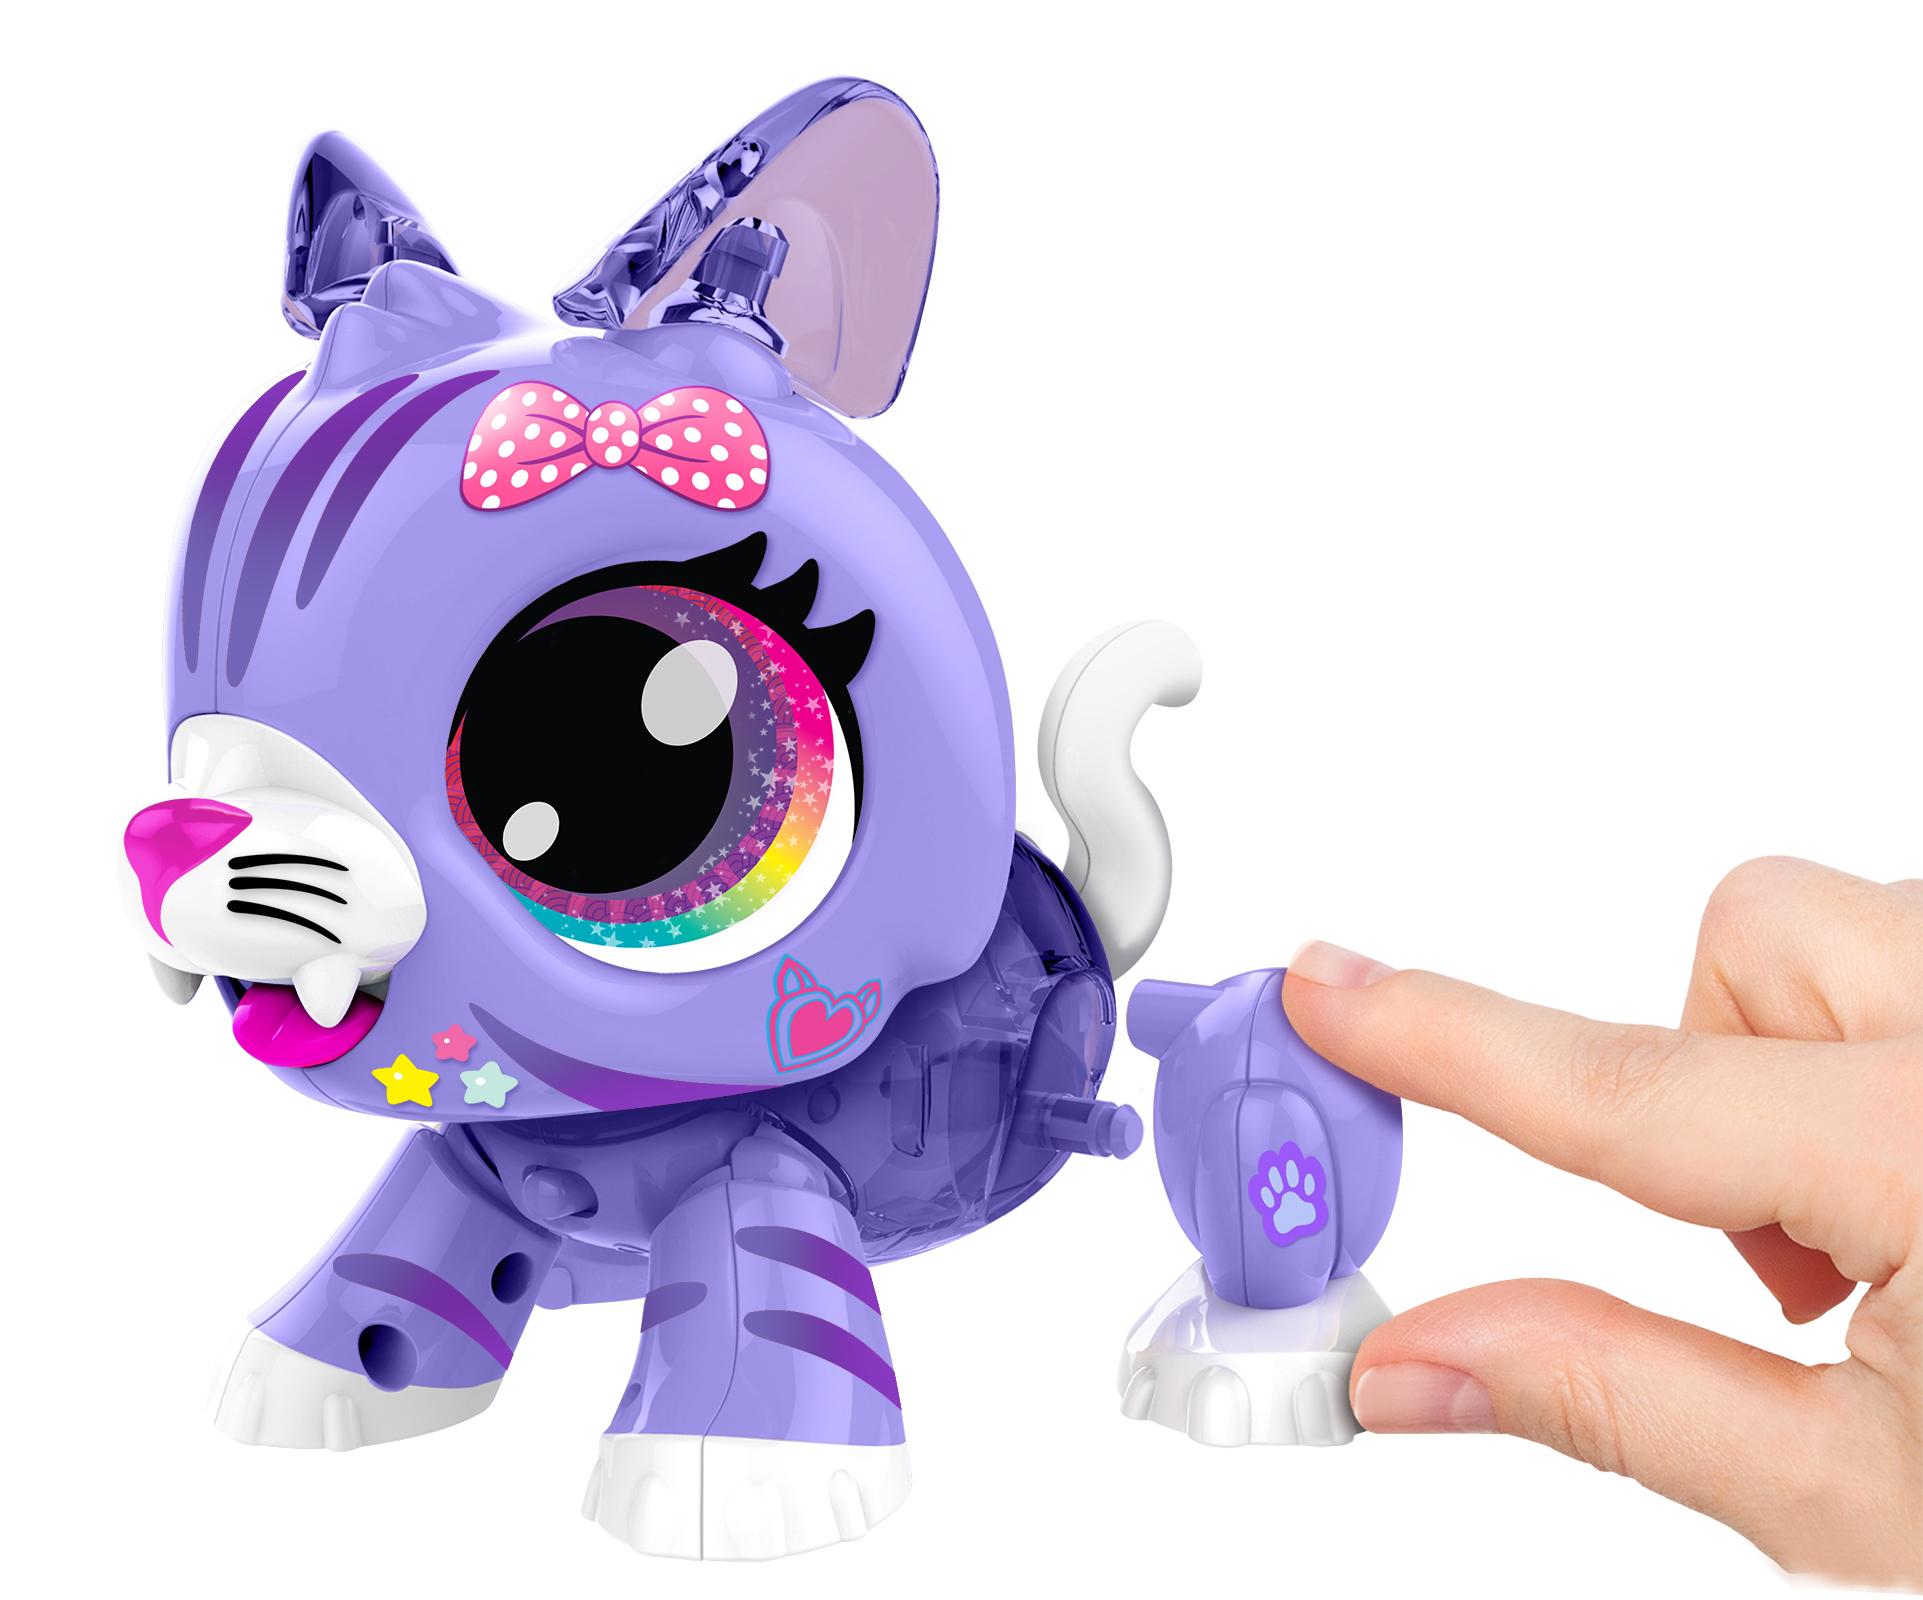 Image 1 Kitten - Hero with Hand - hi-res.jpg